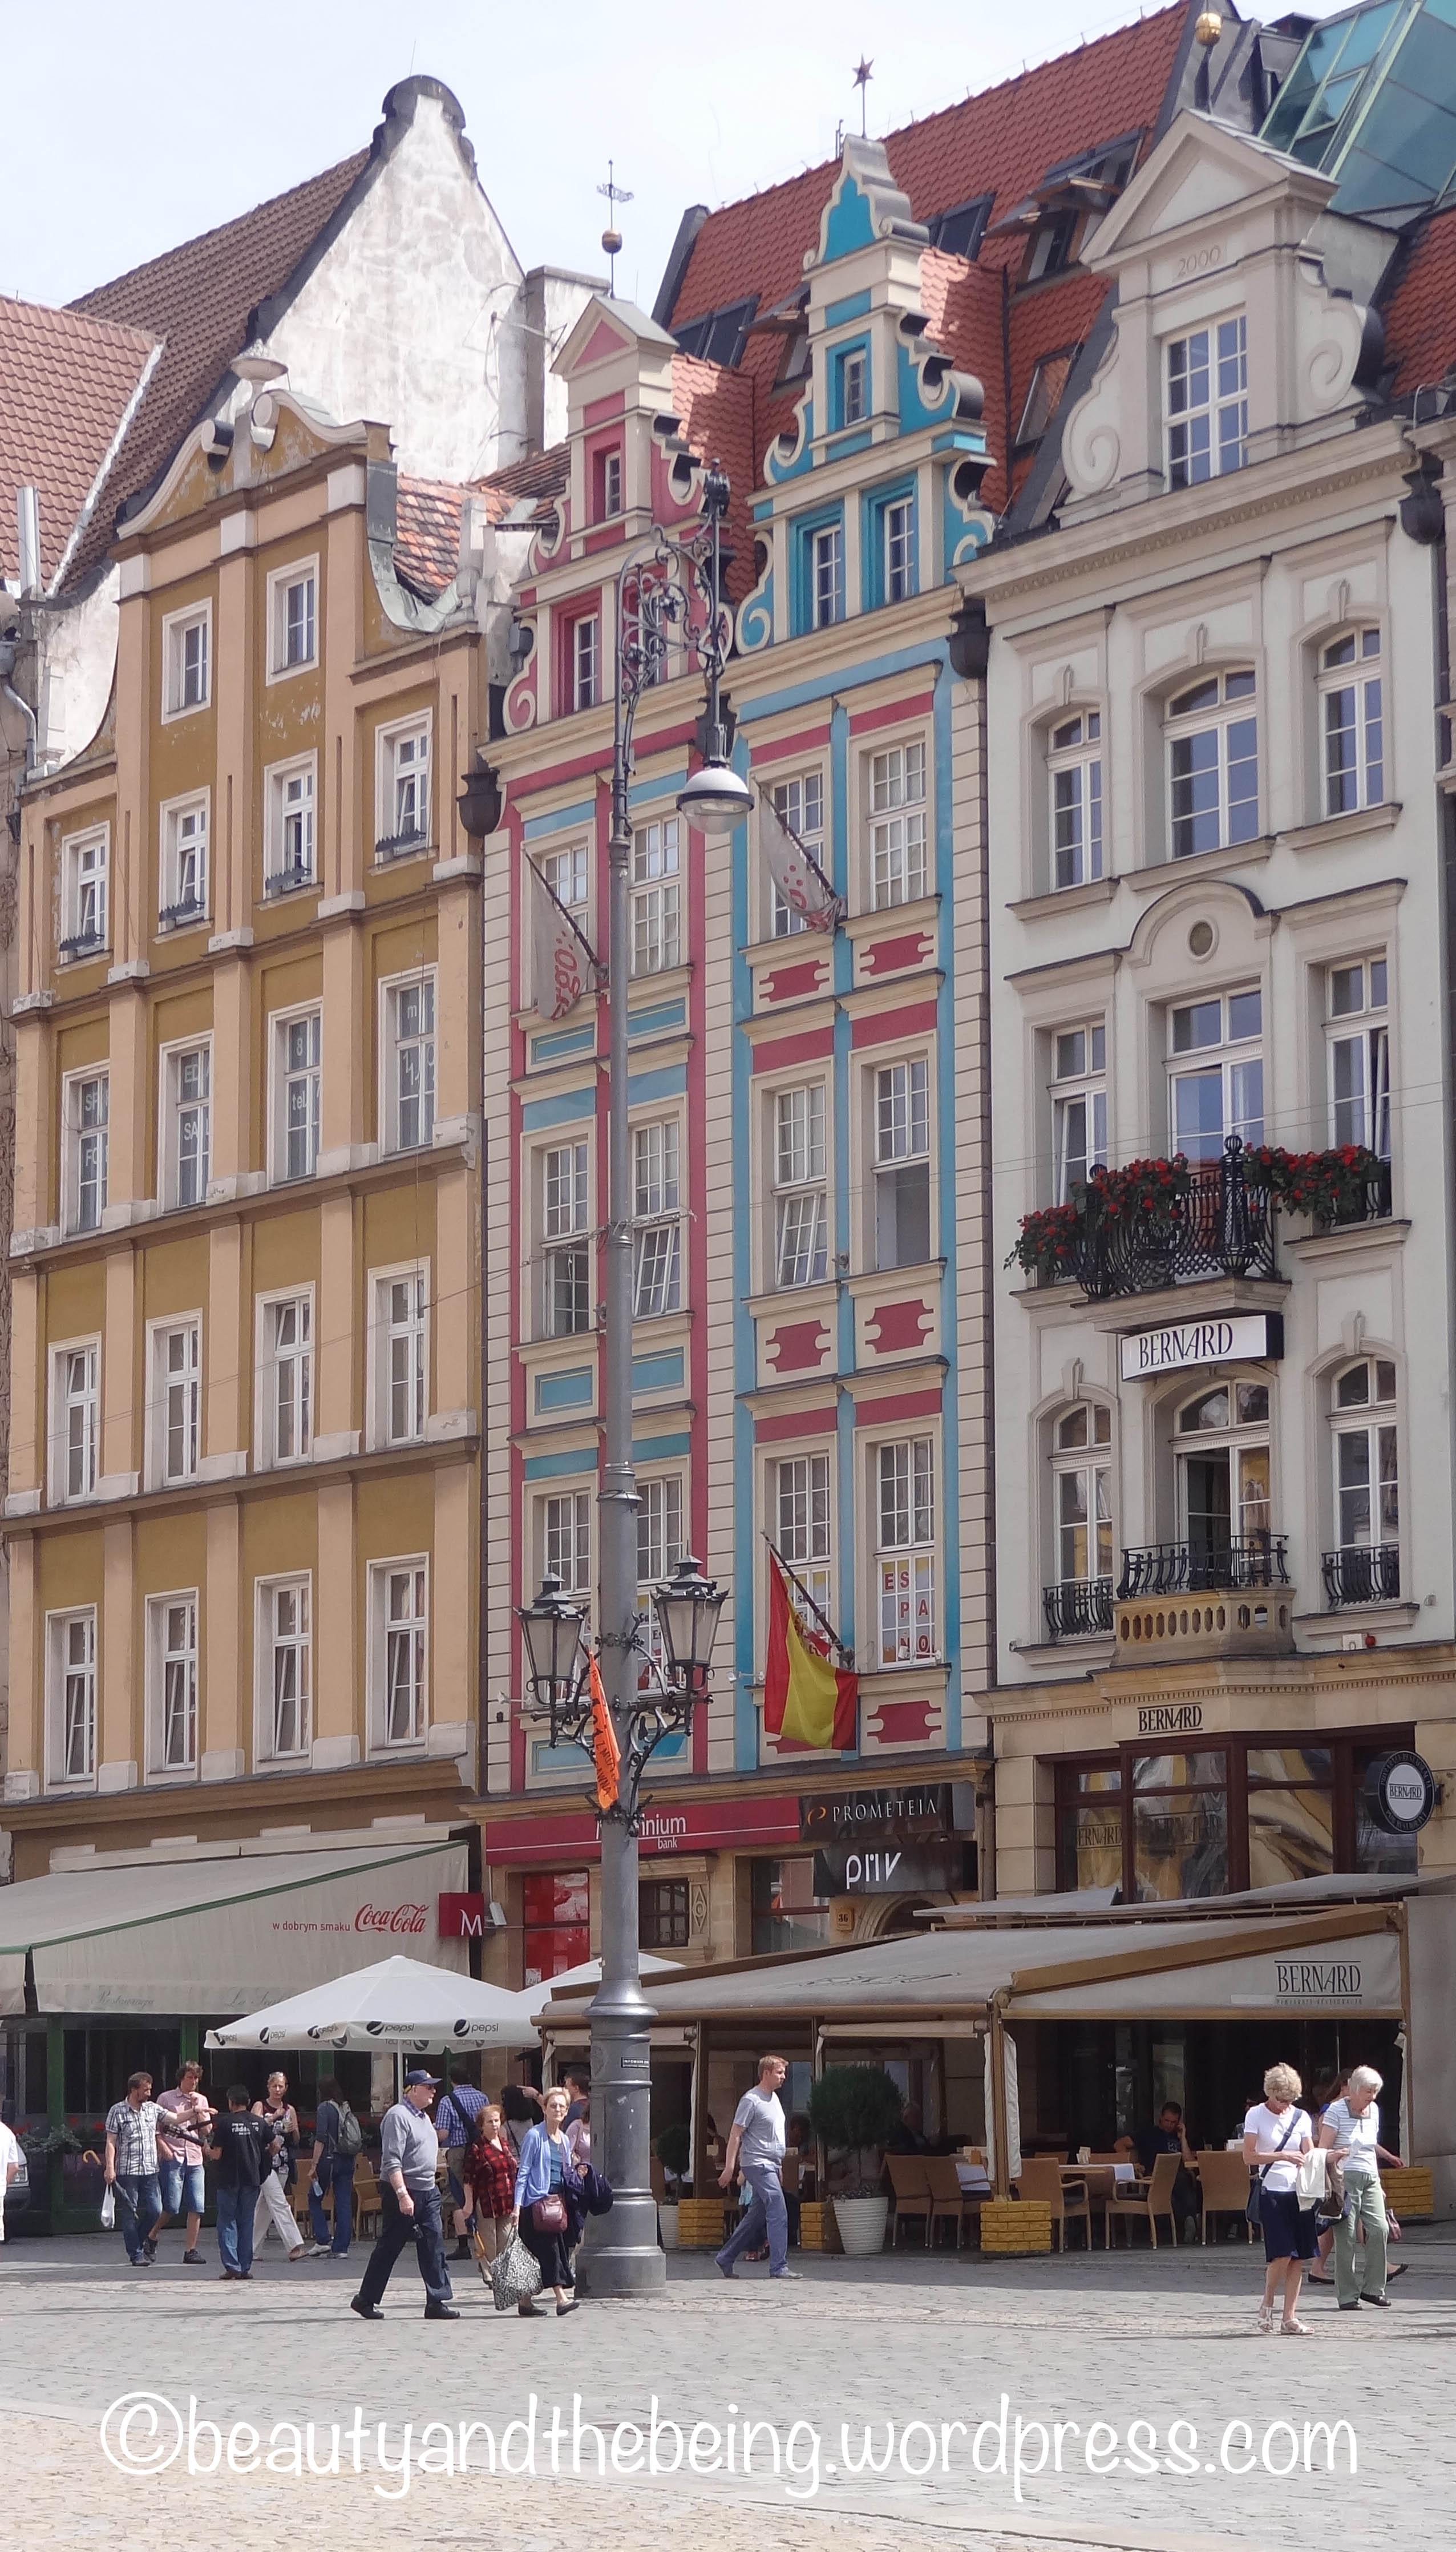 Wroclaw - beautyandthebeing.wordpress.com